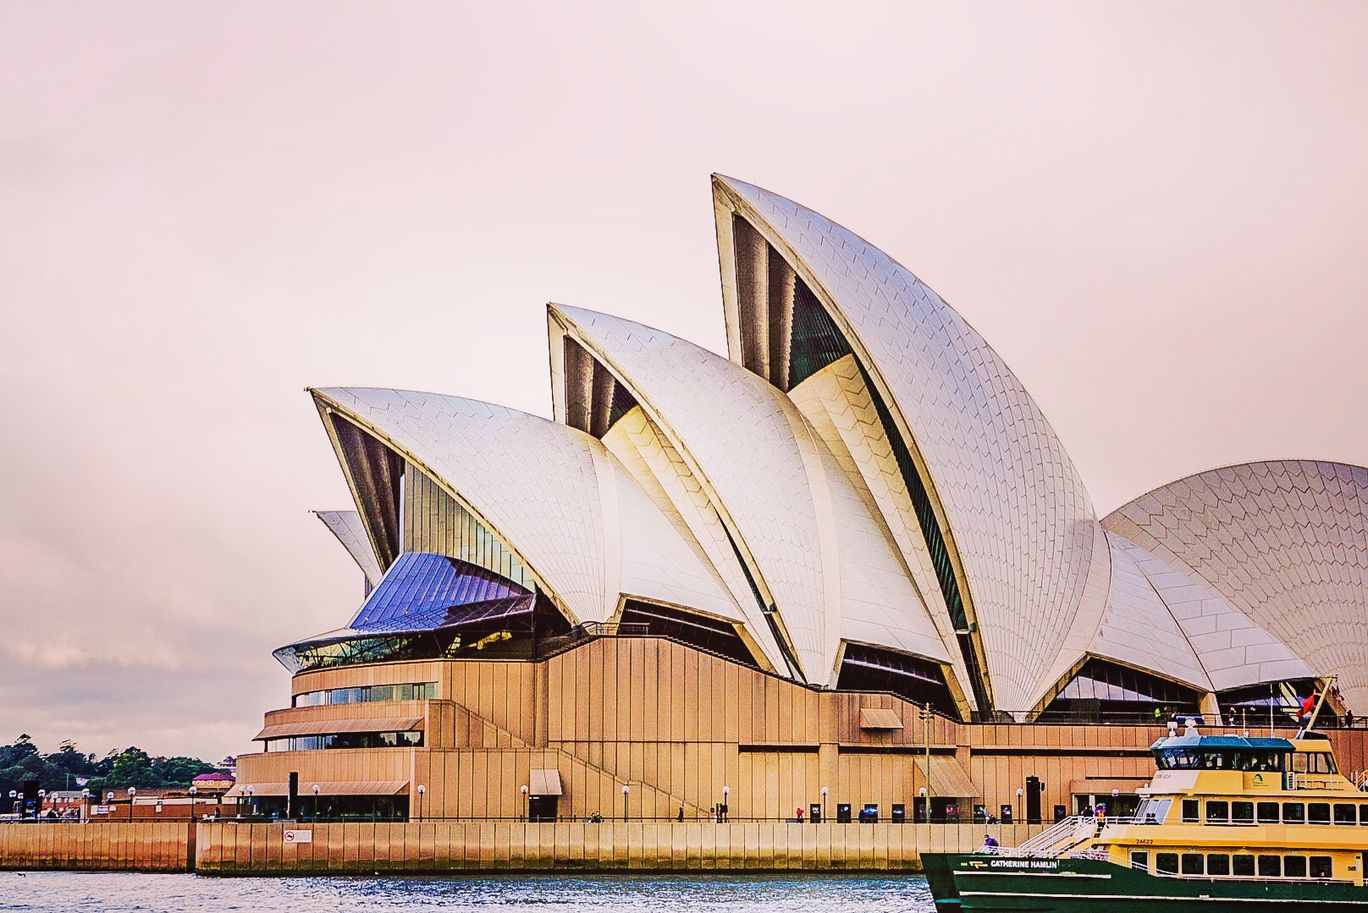 Photo of Sydney By Rishani Rl